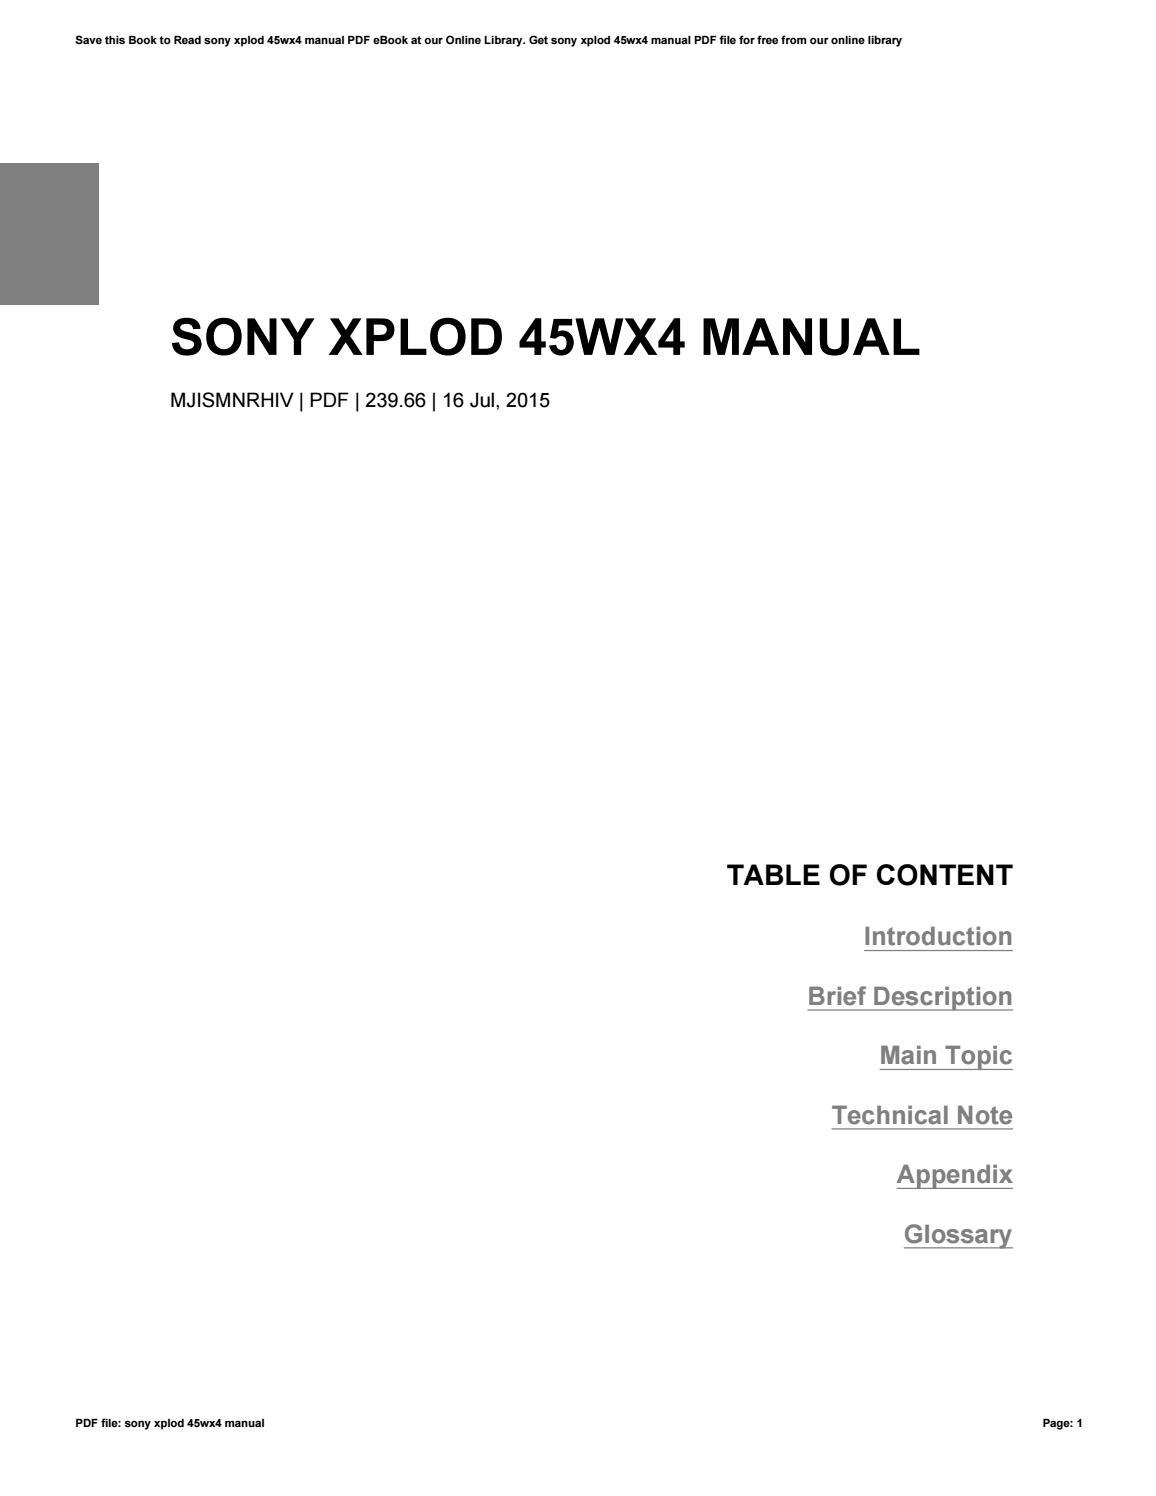 sony xplod 45wx4 manual by coralee mccoy issuu rh issuu com Sony Xplod Manual PDF Sony Xplod Wiring Harness